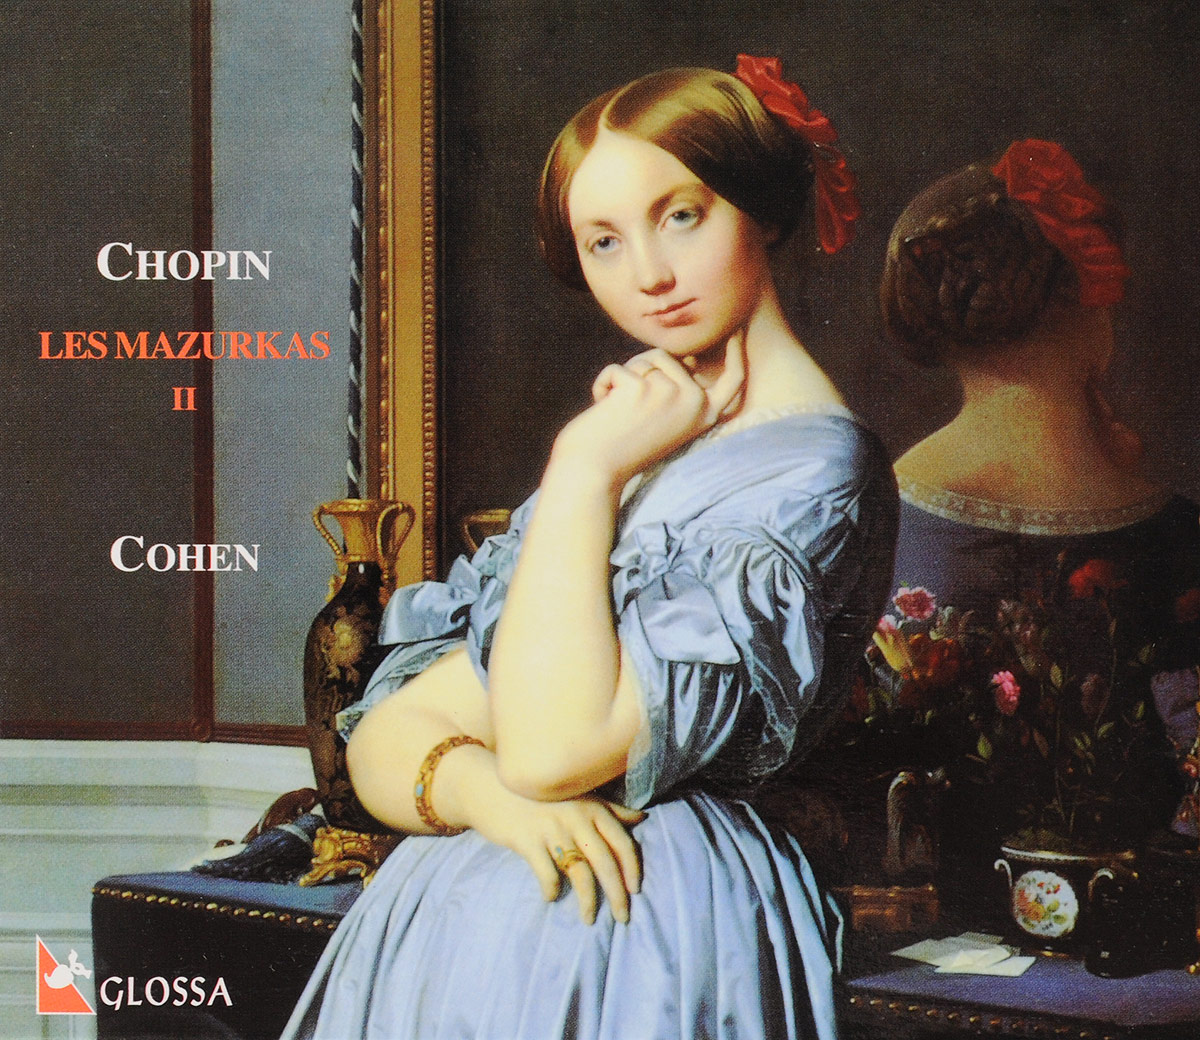 Fryderyk Franciszek Chopin. Chopin: Mazurkas, Vol.2 (Cohen) (2 CD) yulianna avdeeva chopin schubert prokofiev 2 cd